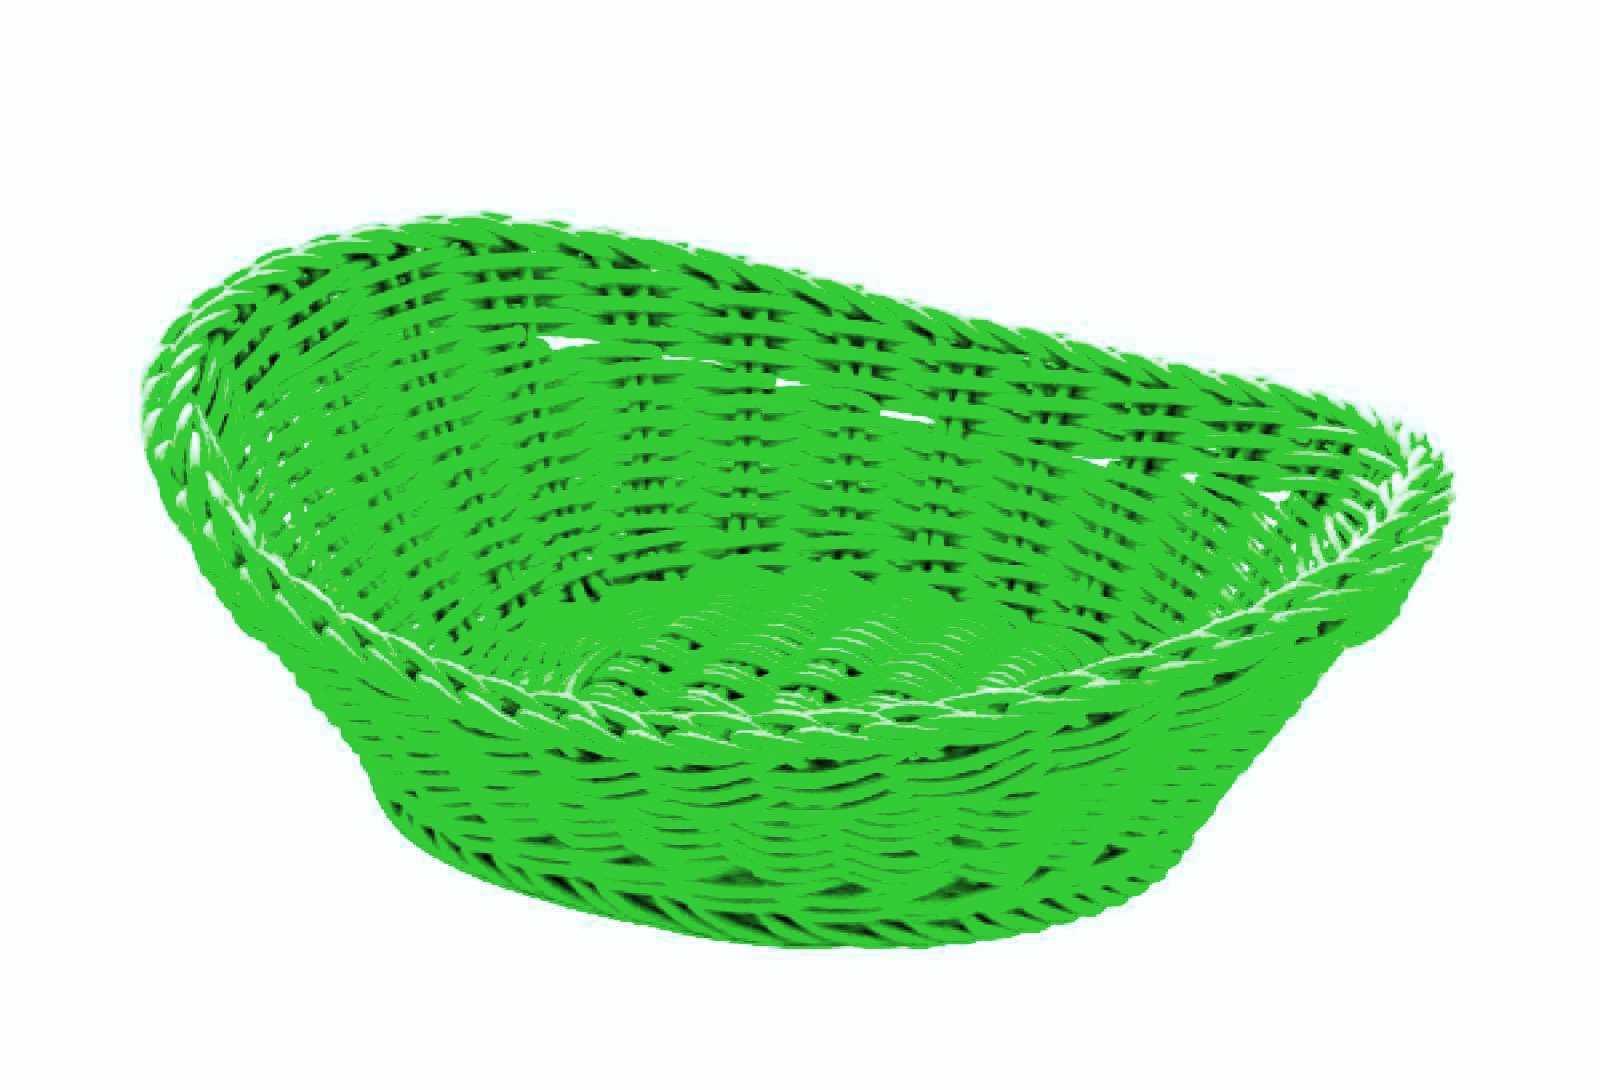 Онлайн каталог PROMENU: Корзина овальная Saleen BASKETS IN TREND COLOURS, 23,5х18х8 см, зеленый Saleen 020961 371